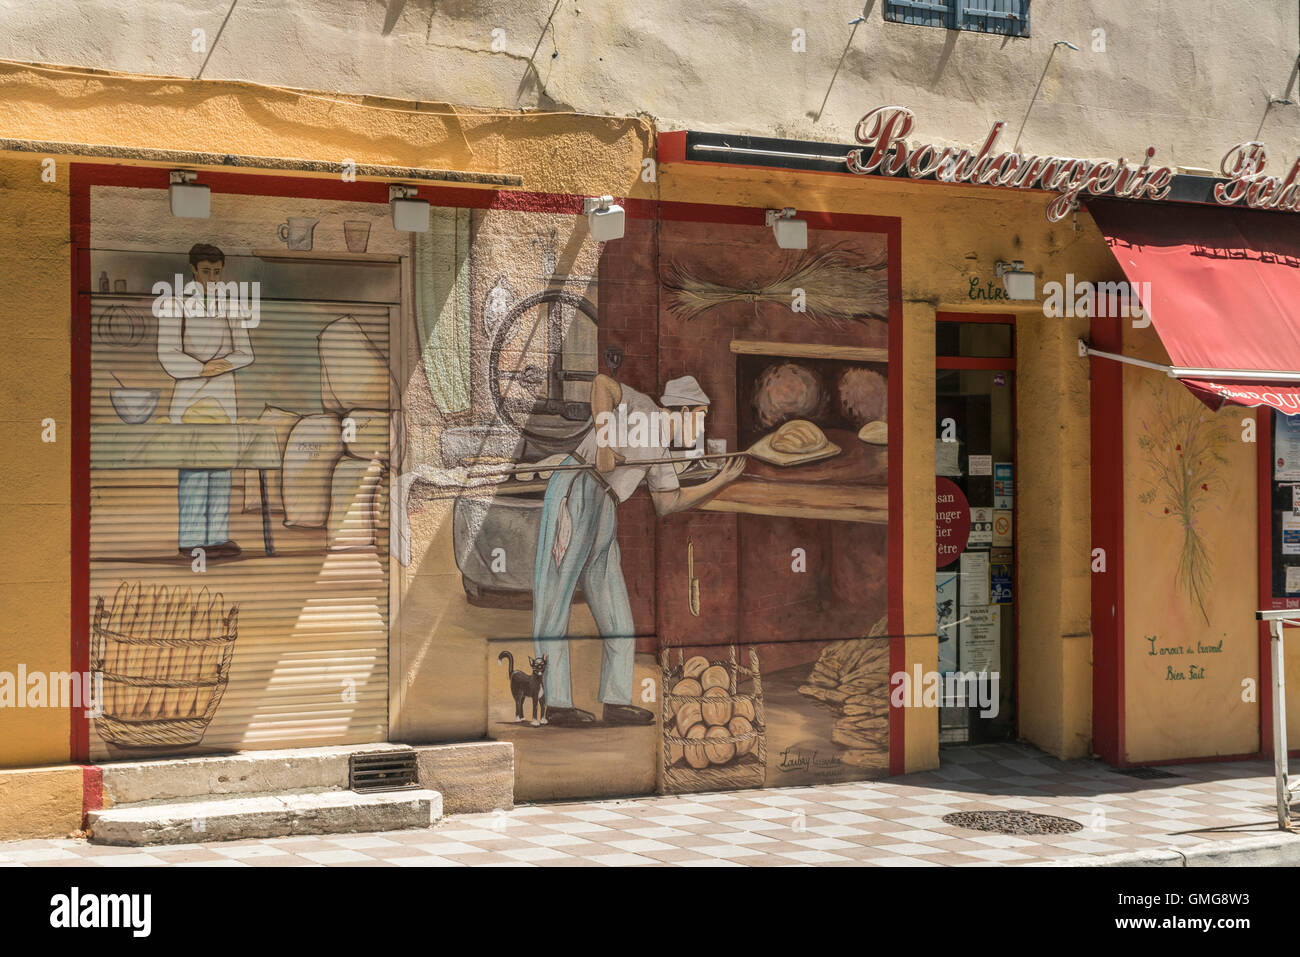 Boulangerie, Wall panting, Barjols, Var,  Provence, France - Stock Image